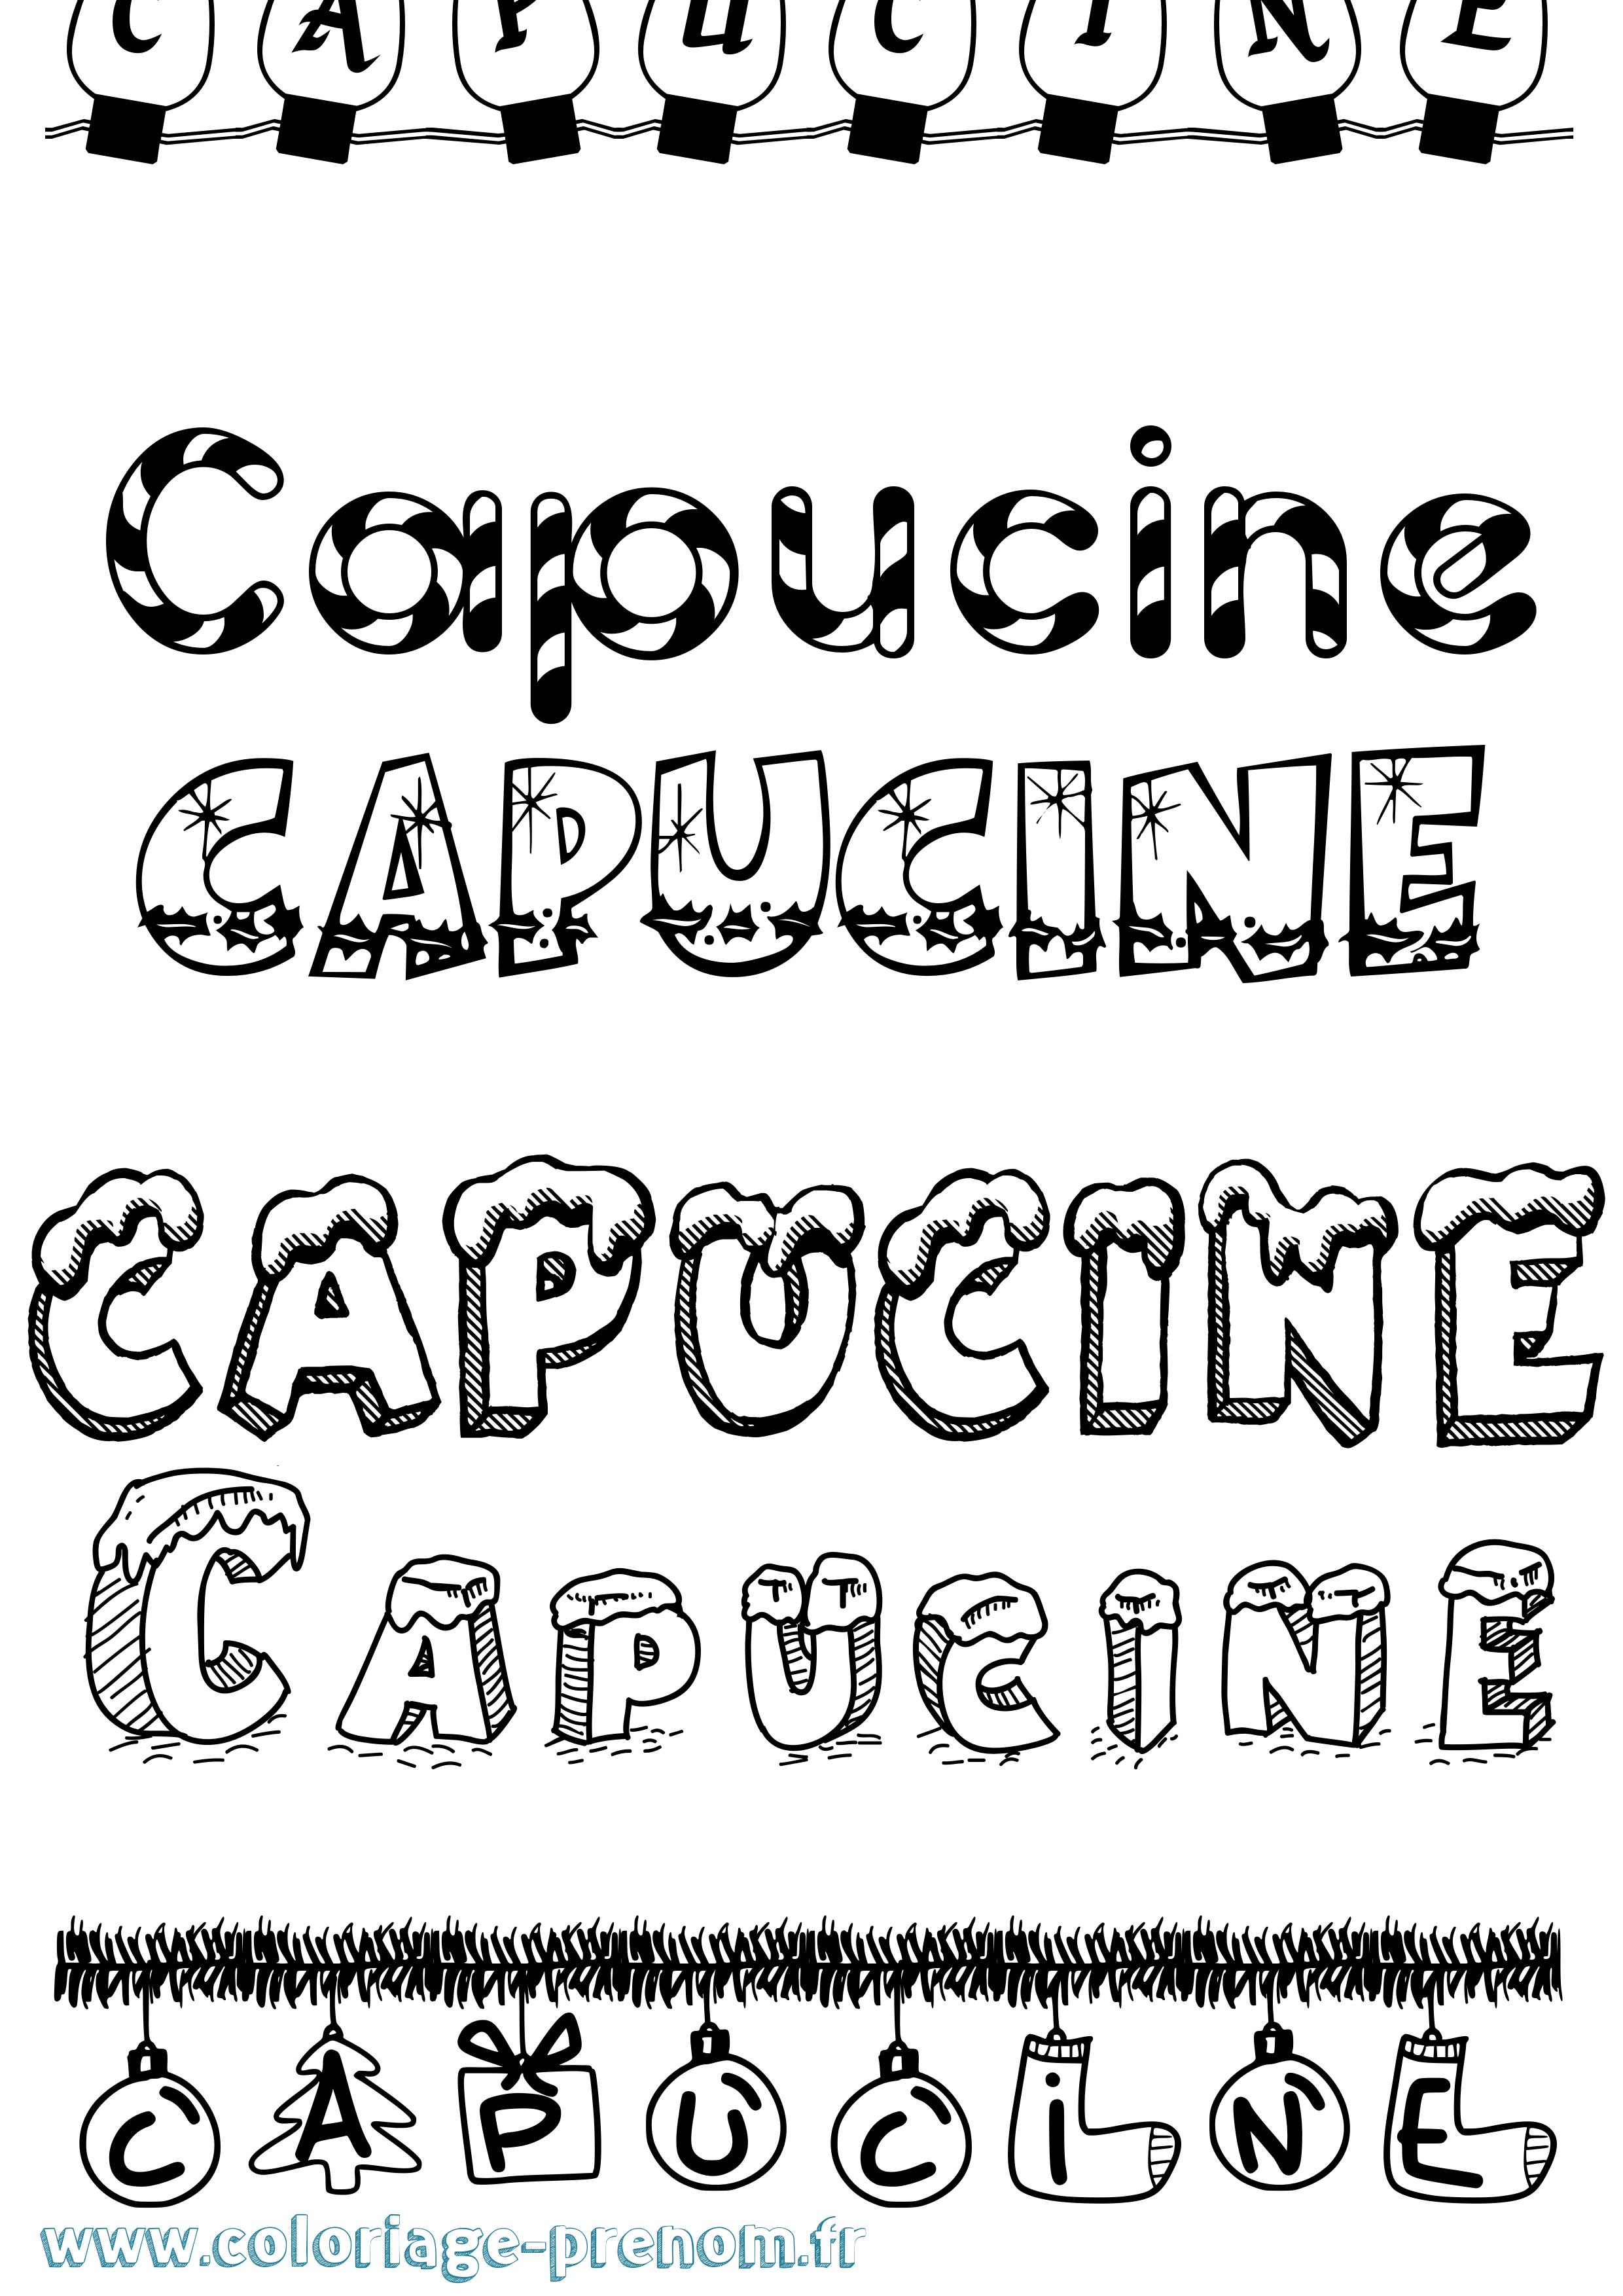 Coloriage capucine - Coloriage fleur capucine ...